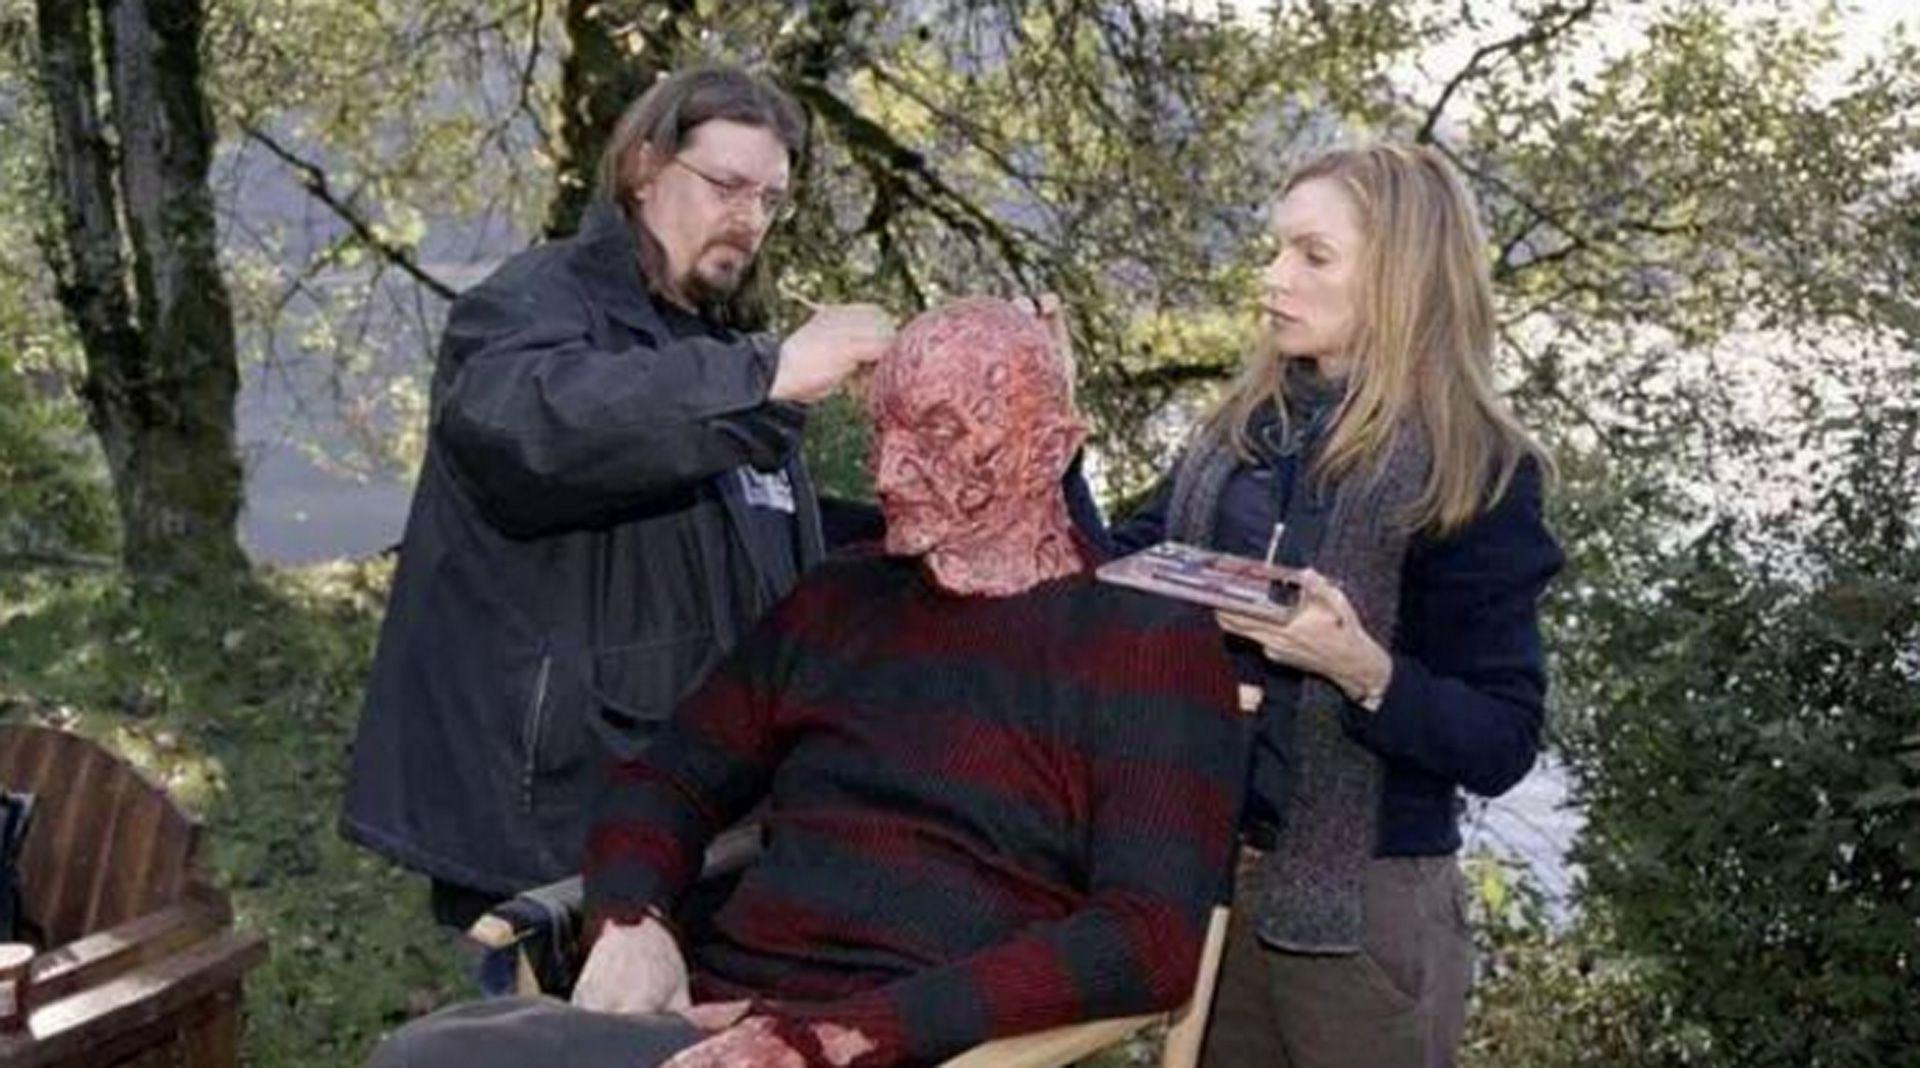 Robert Englund maquillándose para interpretar a Freddy Krueger